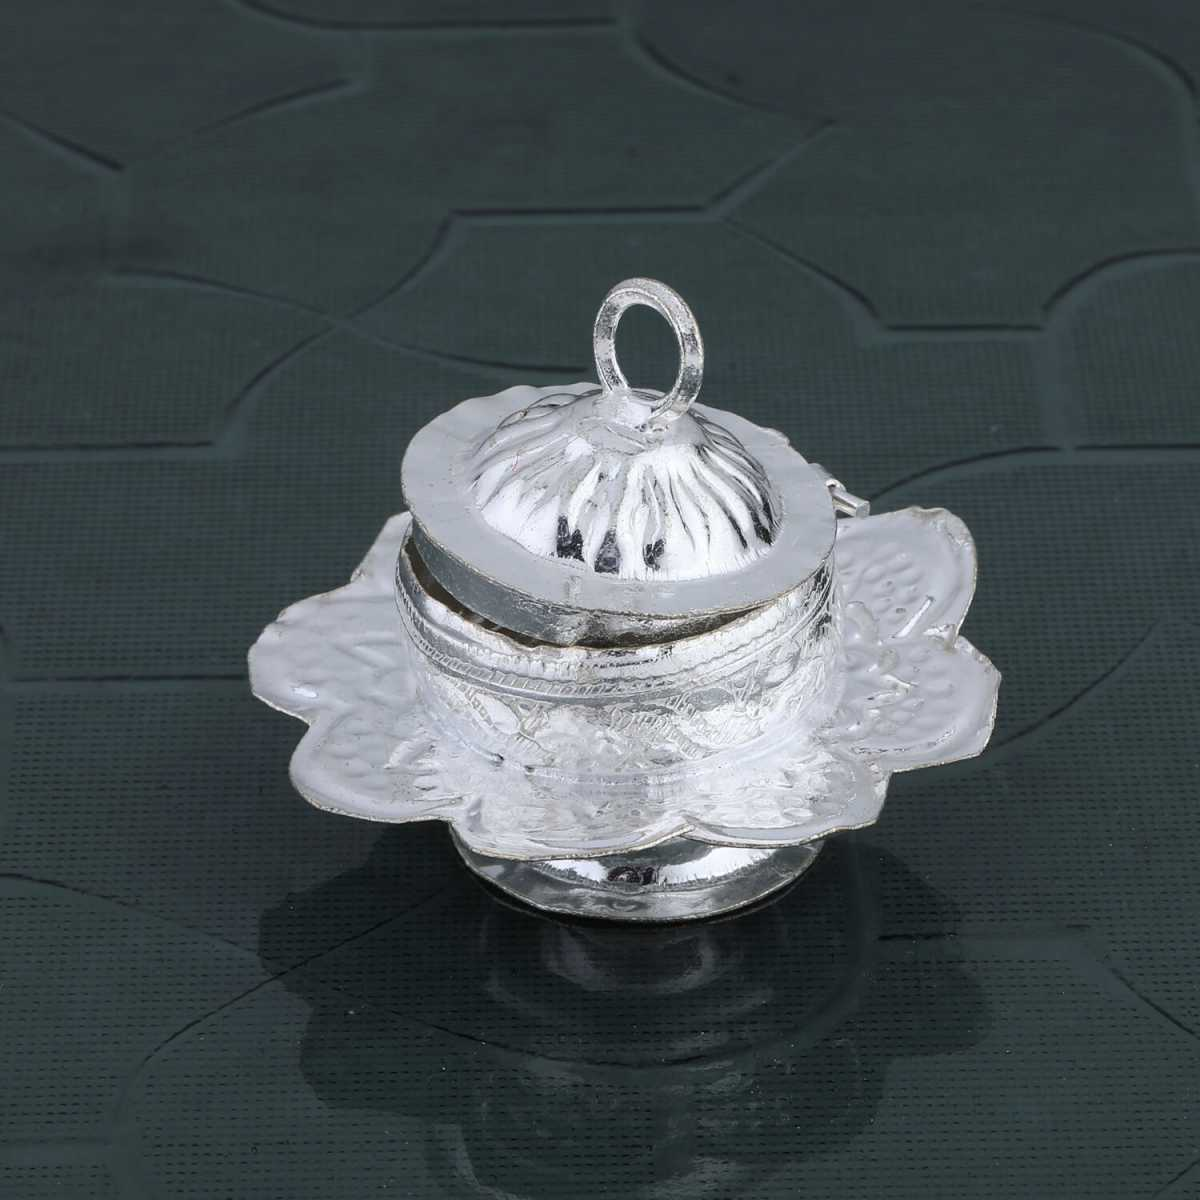 Silver Shine Silver Plated  Flower Design Kankavati/Sindoor Dabbi Set of 1